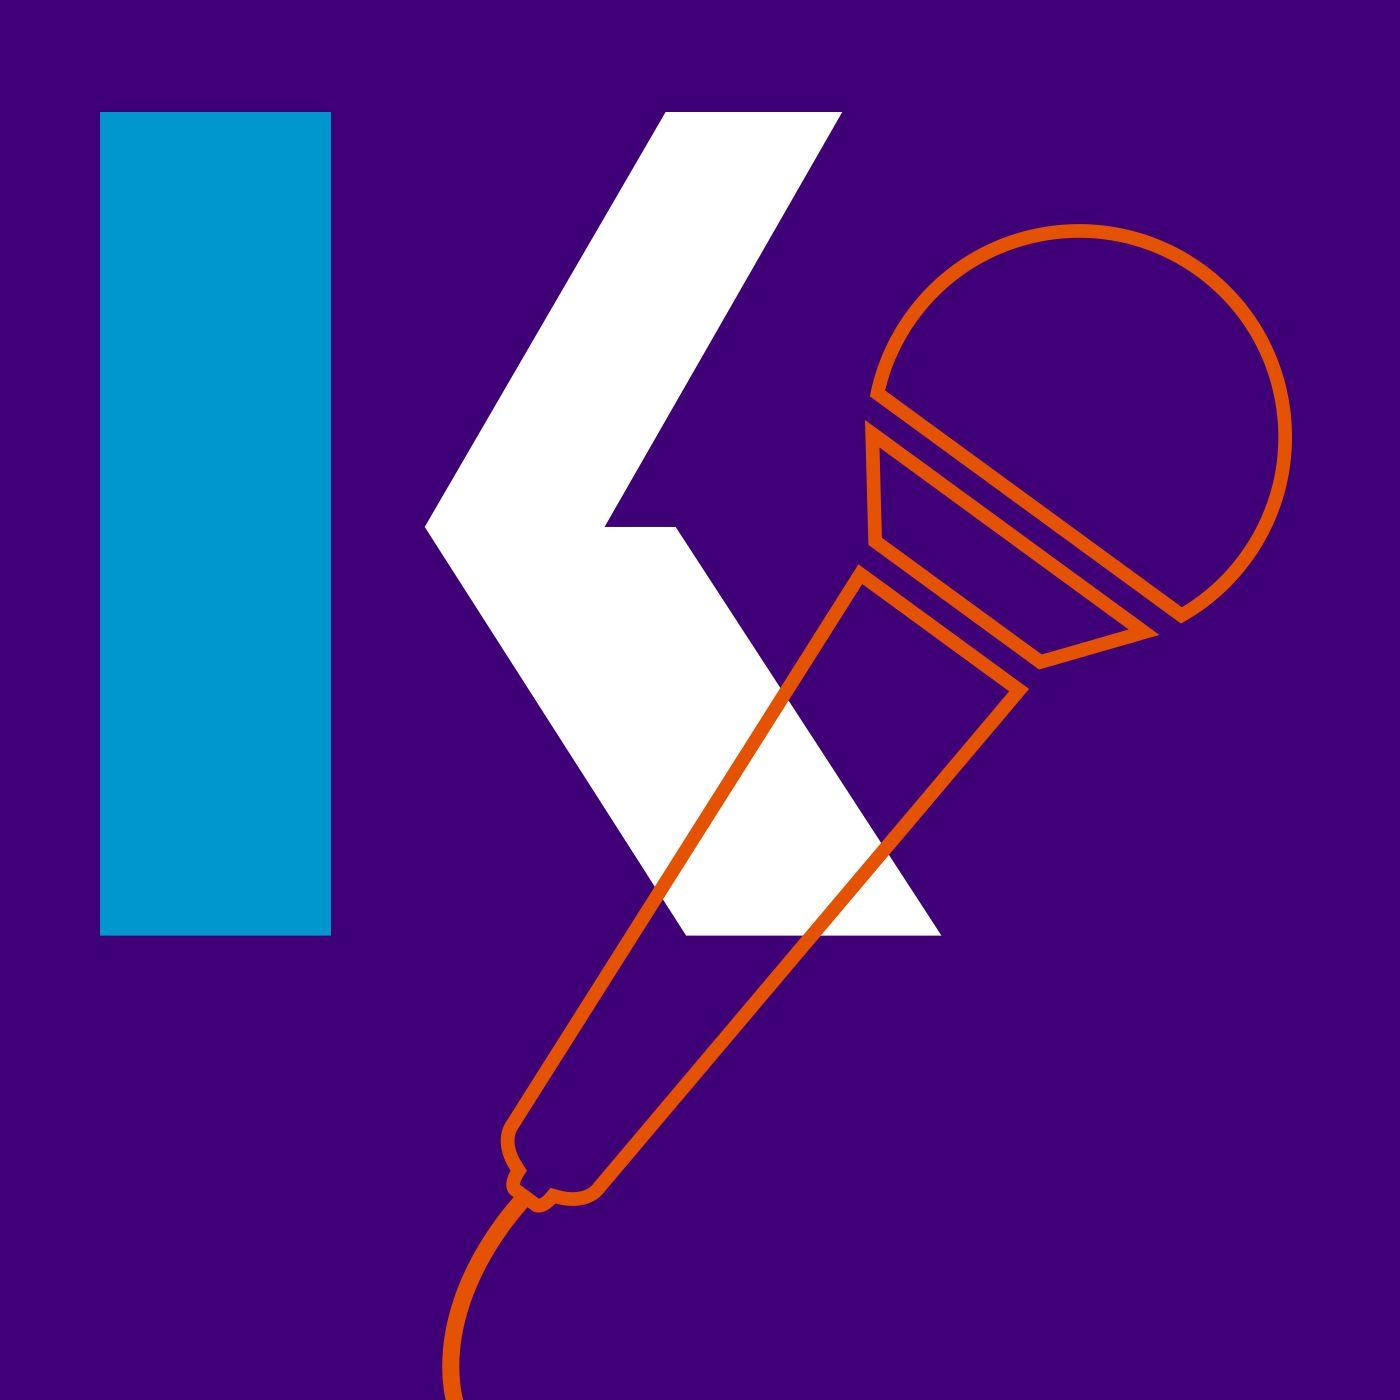 Kaplan's NCLEX Prepcast - Episode 25 - Tips for International NCLEX® Students